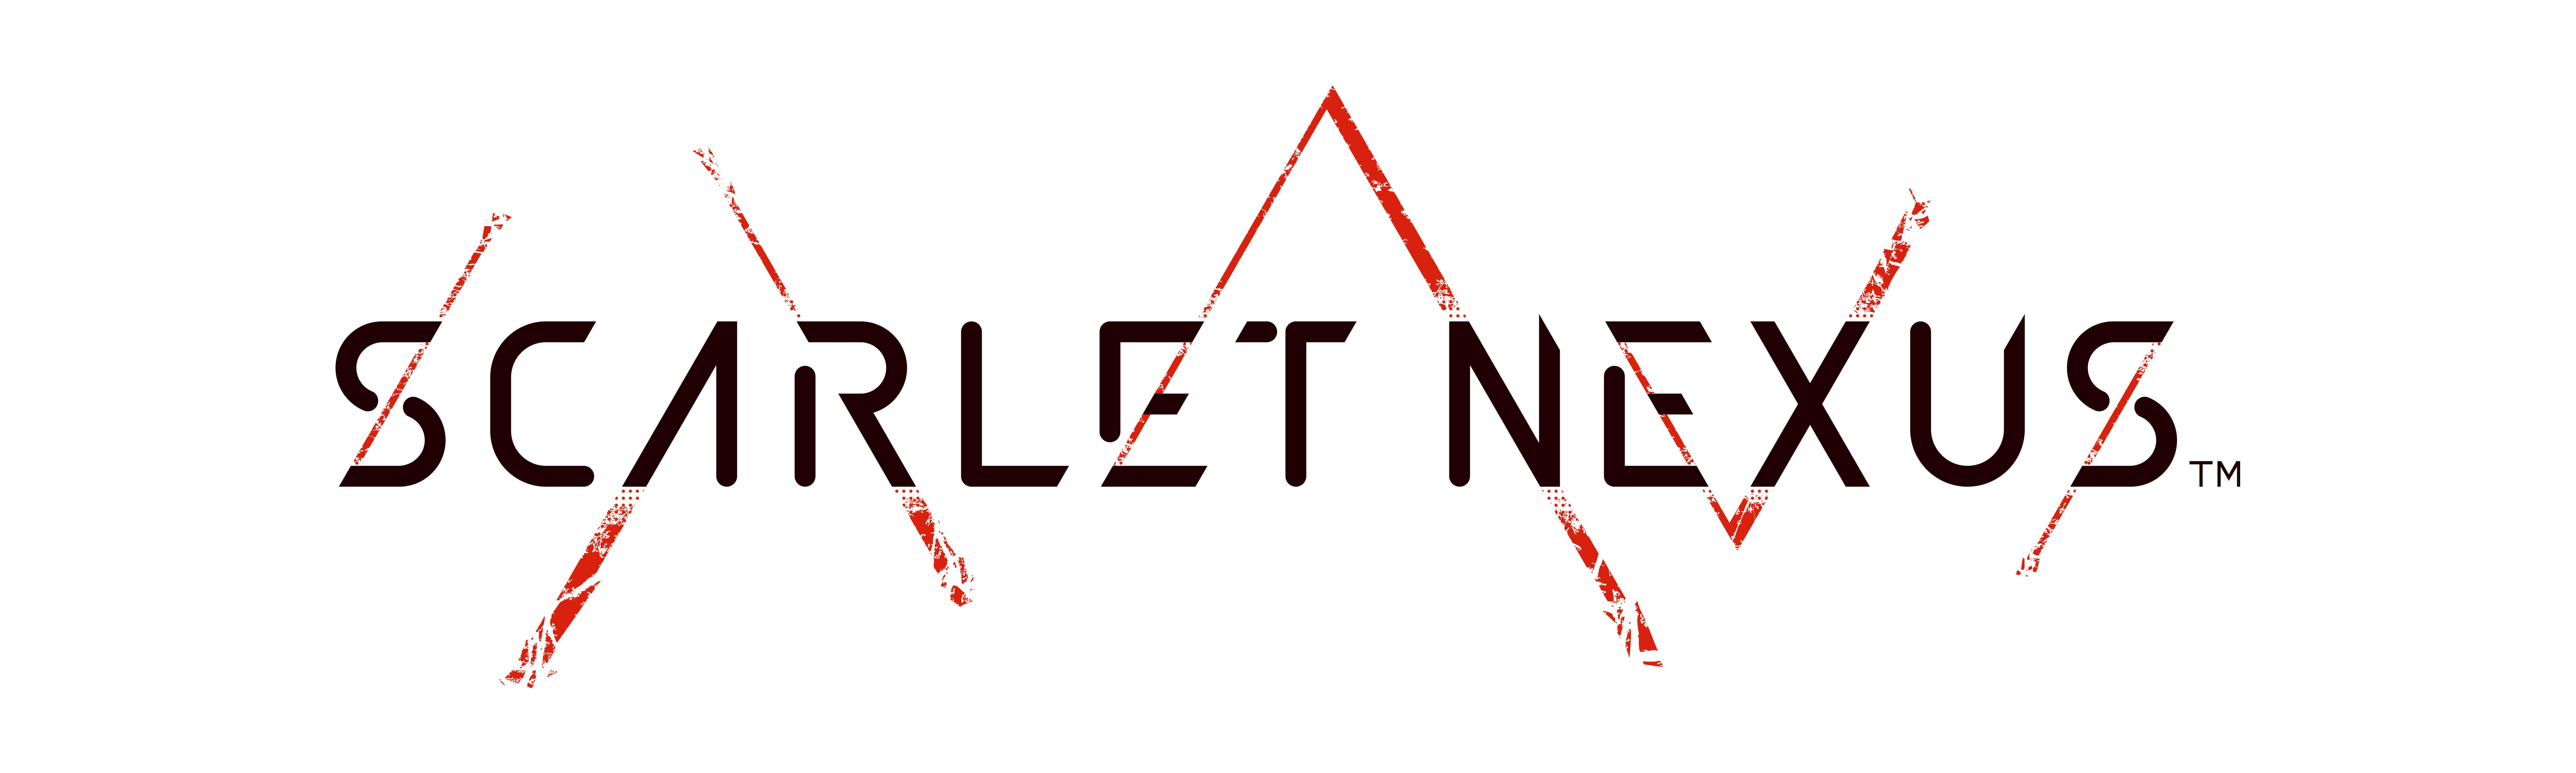 SCARLET NEXUS™ & (C)BANDAI NAMCO Entertainment Inc.